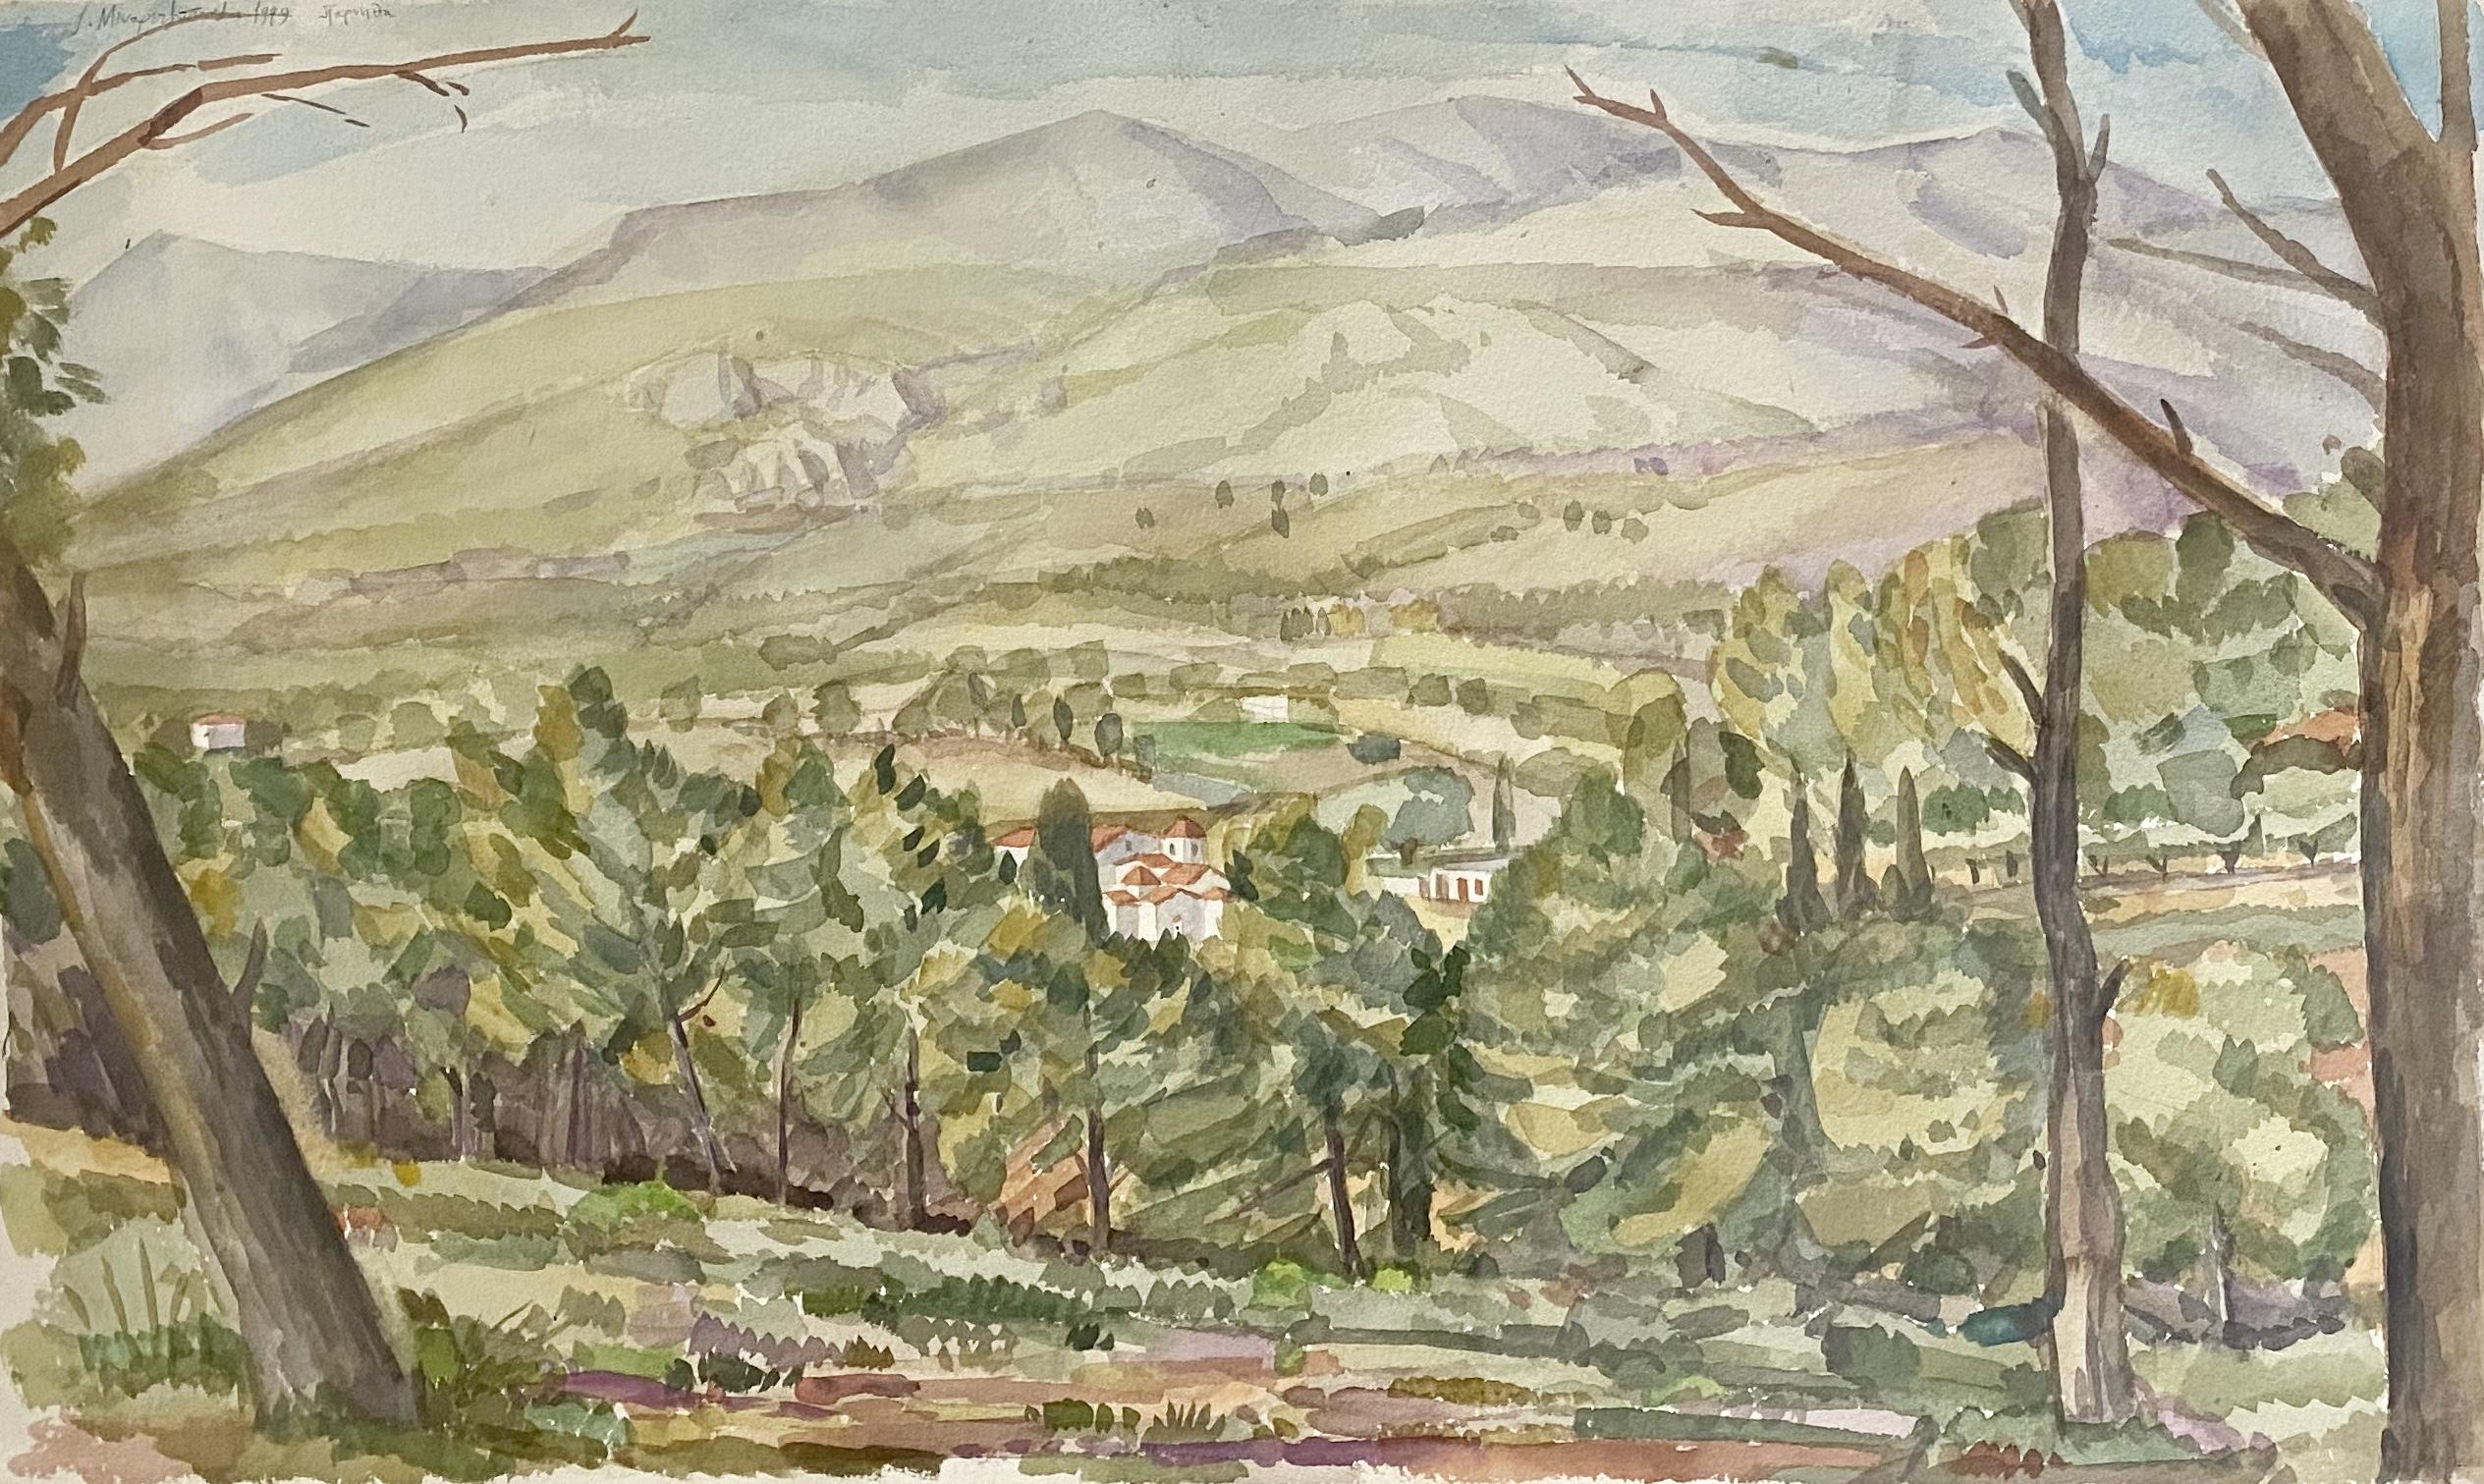 Ioakeim Minaretzopoulos (Greek), Parnitha, 1999, watercolor on paper, 40 x 65 cm